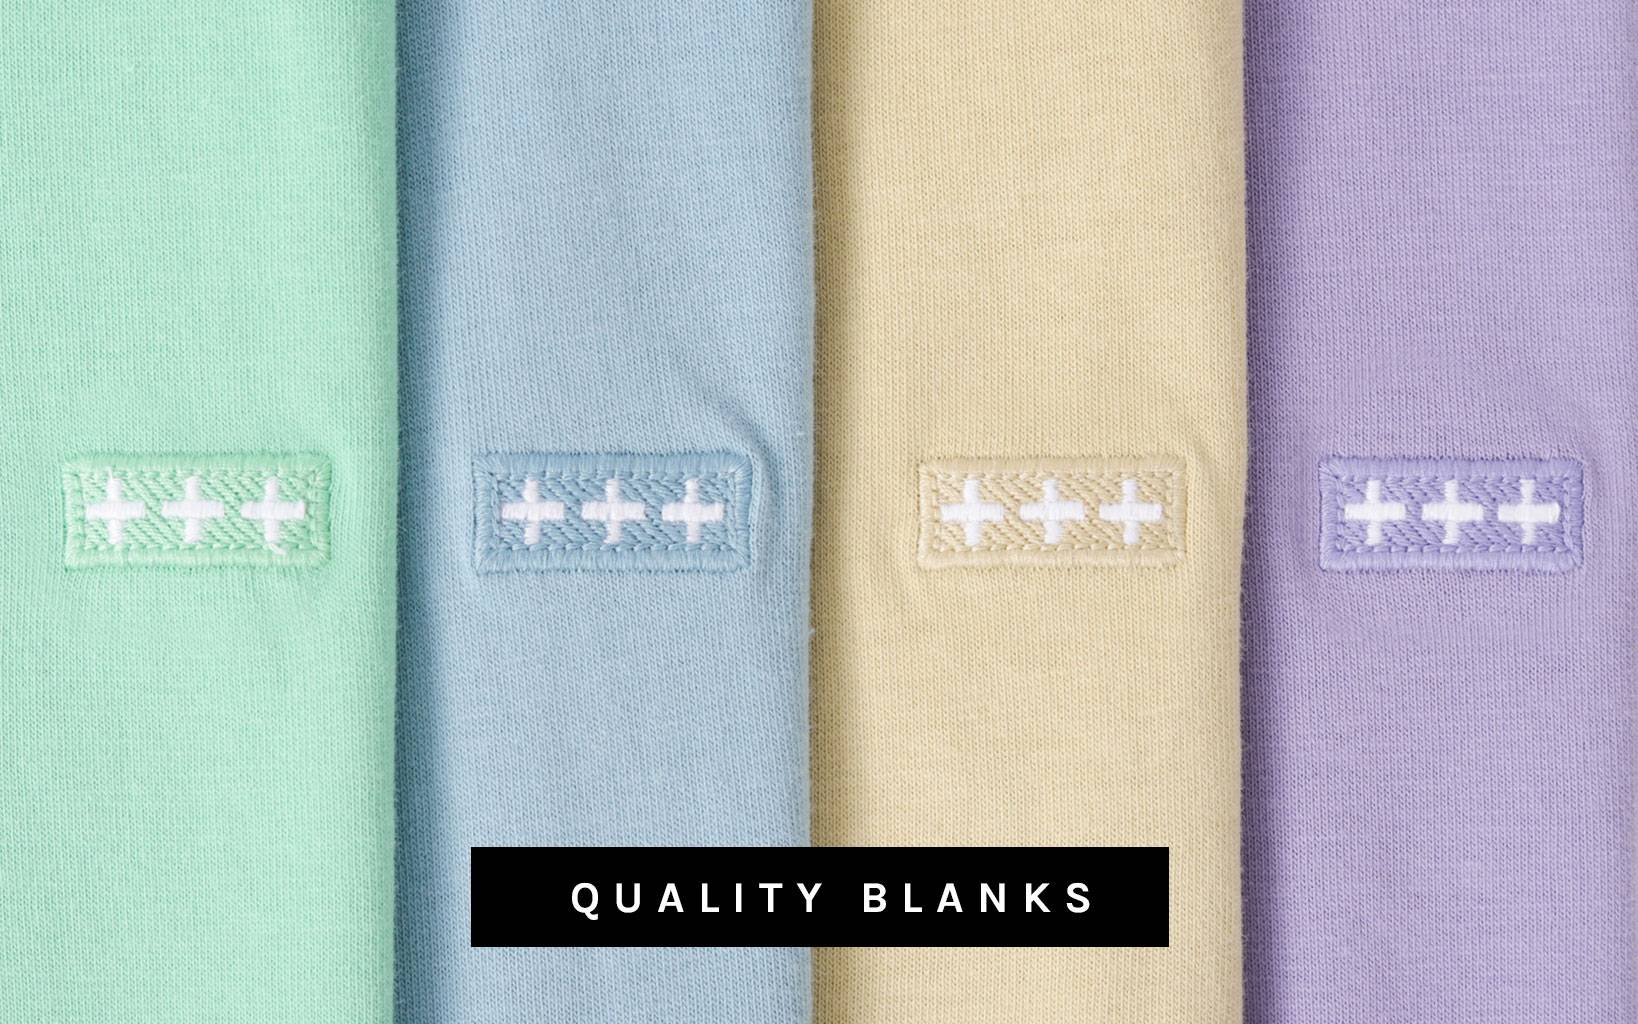 Quality Blanks